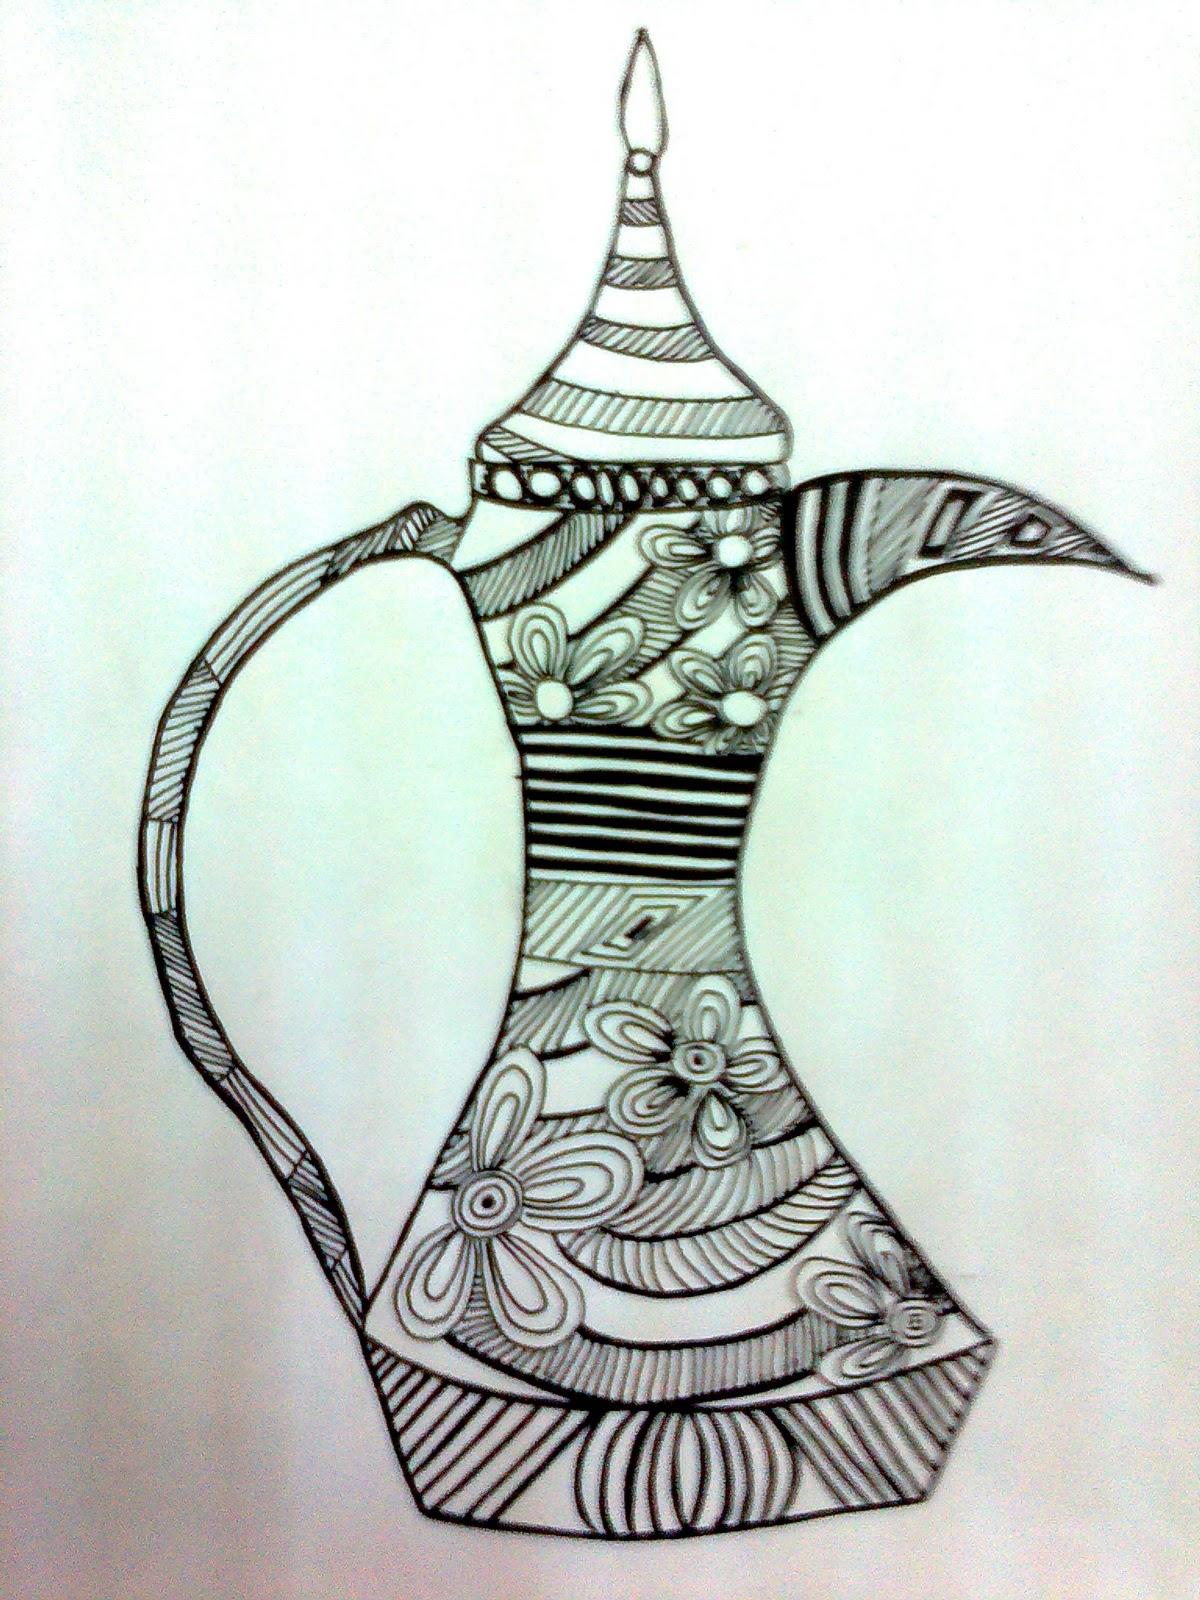 مشـــاعر فنيـــة فبراير 2011